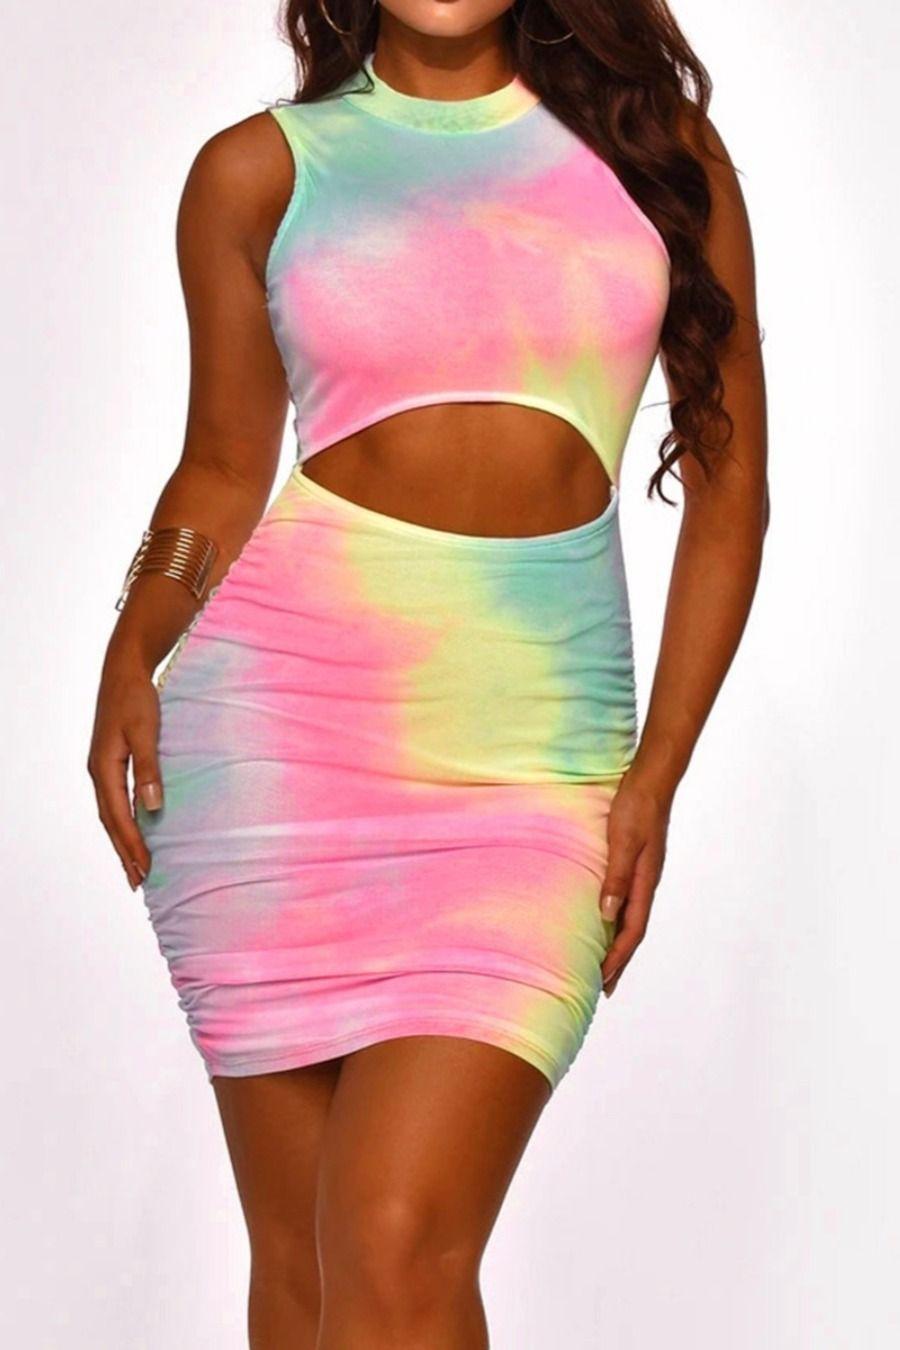 Tie Dye Backless Cutout Tie Back Bodycon Dress Tie Dye Bodycon Dress Partywear [ 1350 x 900 Pixel ]